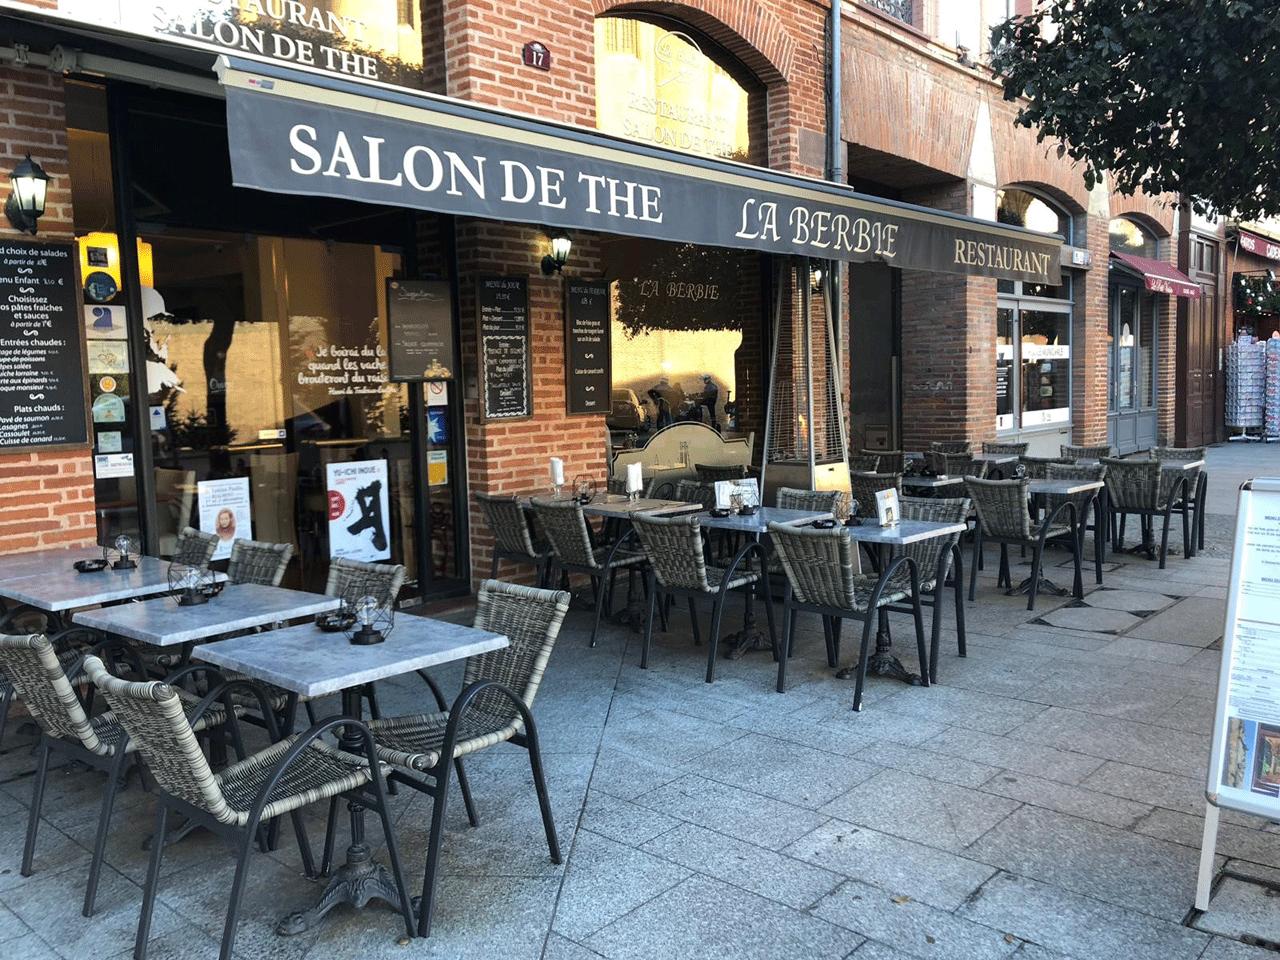 Restaurant Salon de Thé La Berbie-Albi